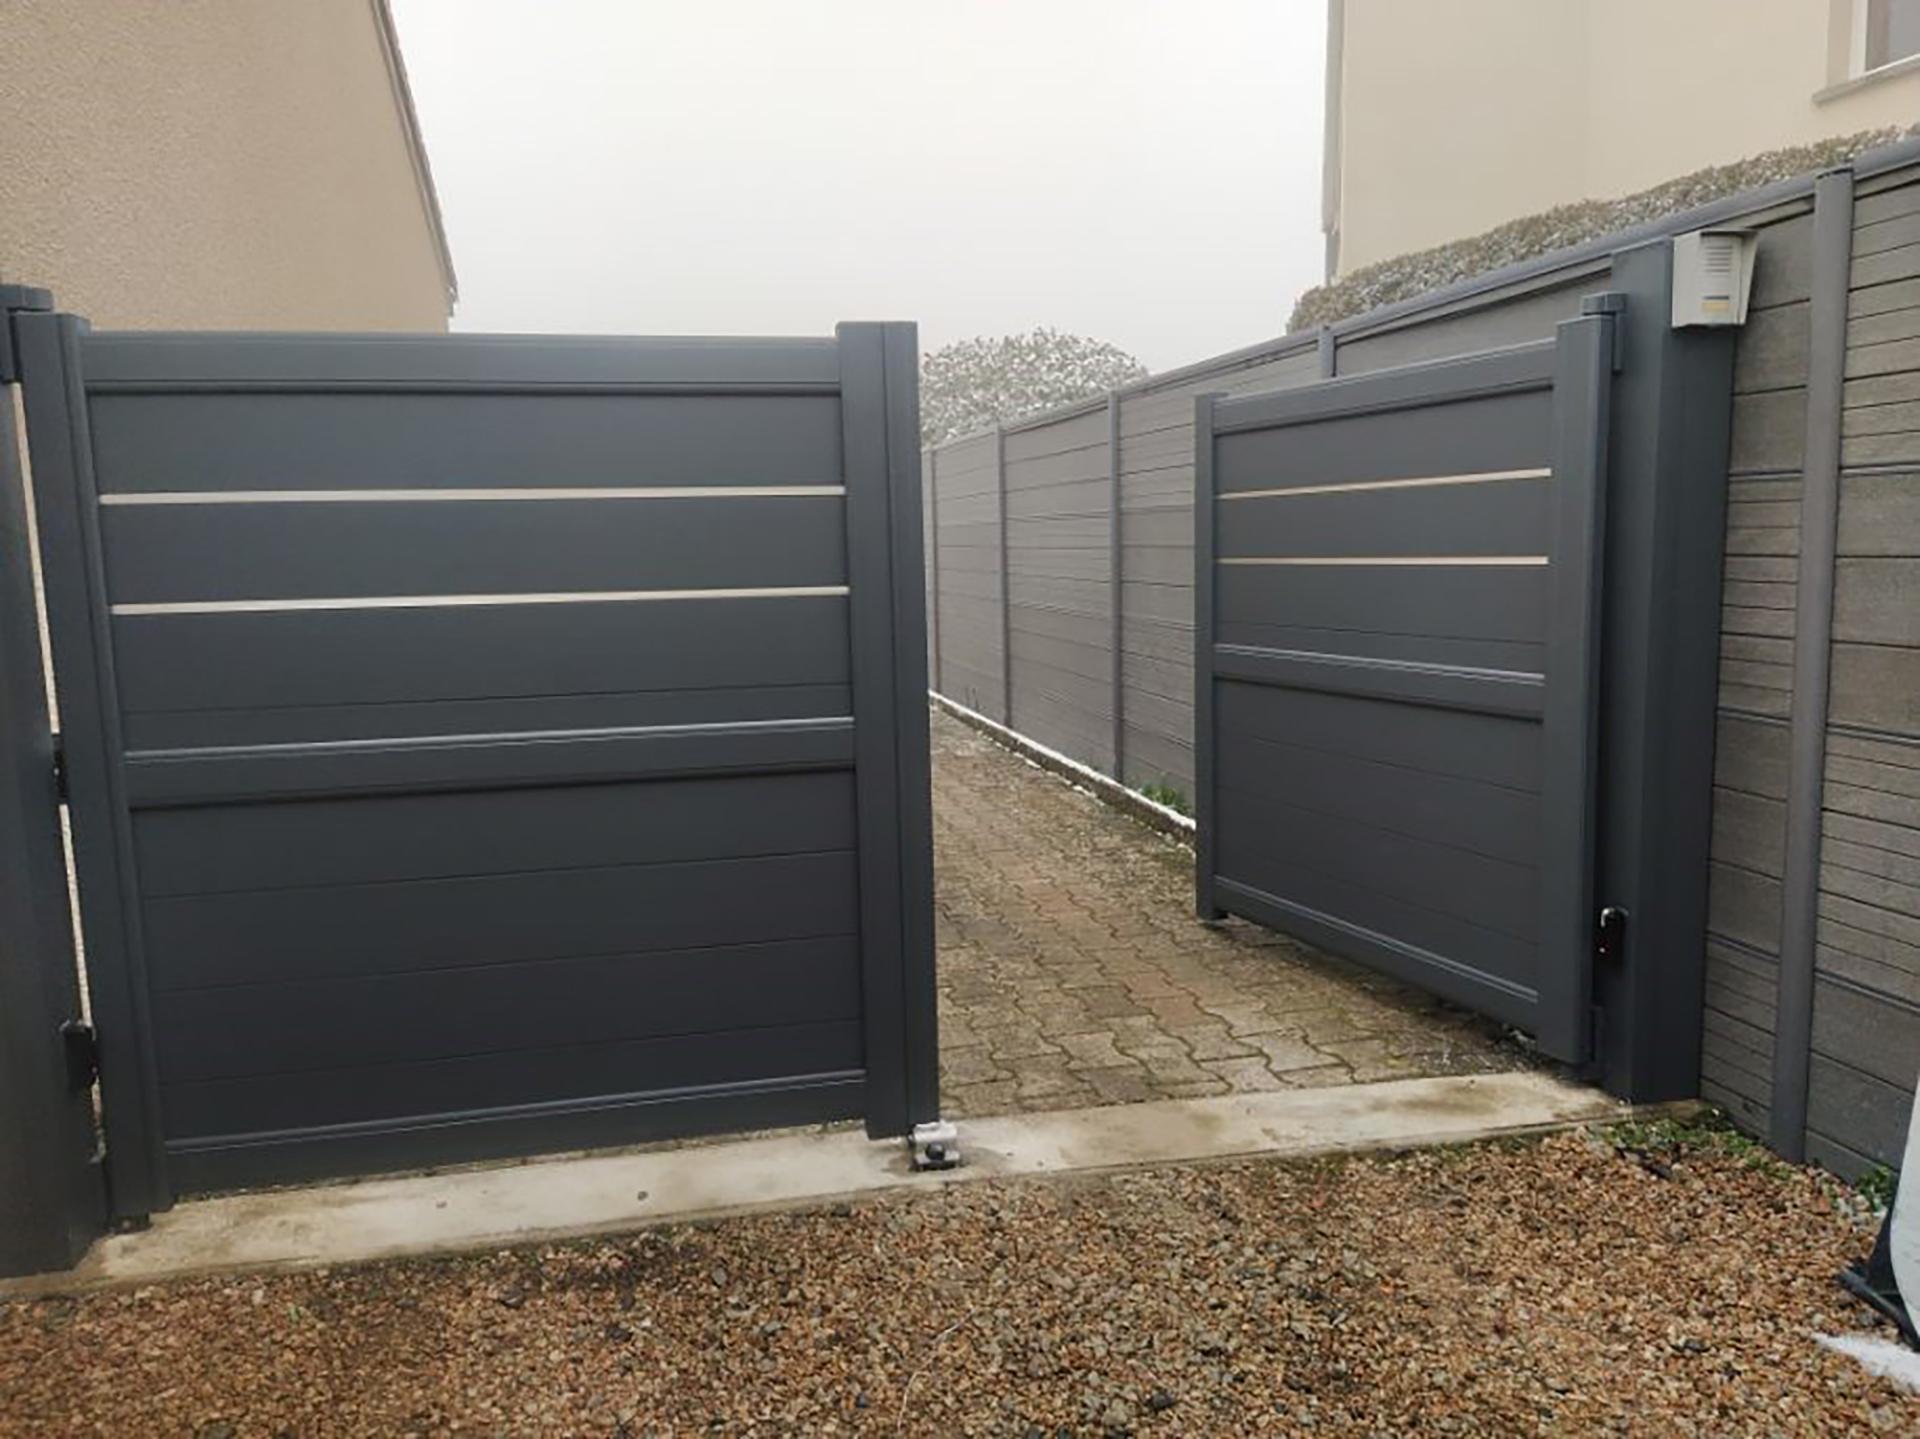 portail battant aluminium et liserets metalique